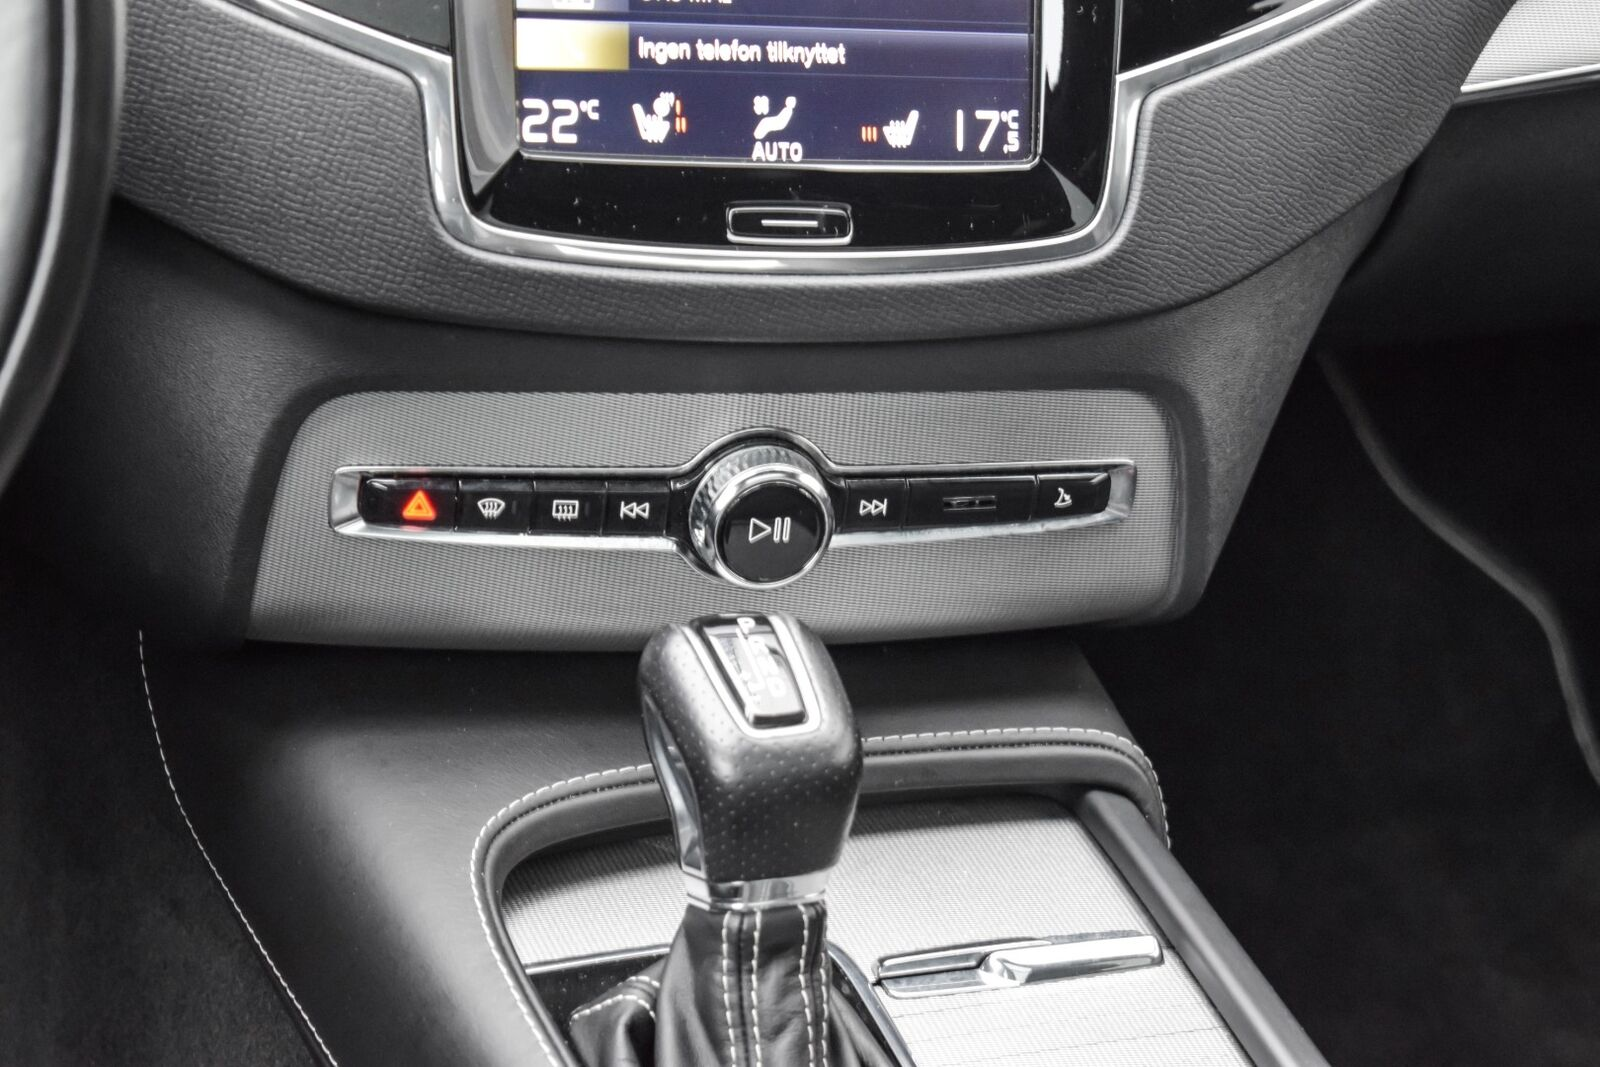 Volvo XC90 2,0 D5 225 R-Design aut. AWD 7prs - billede 11